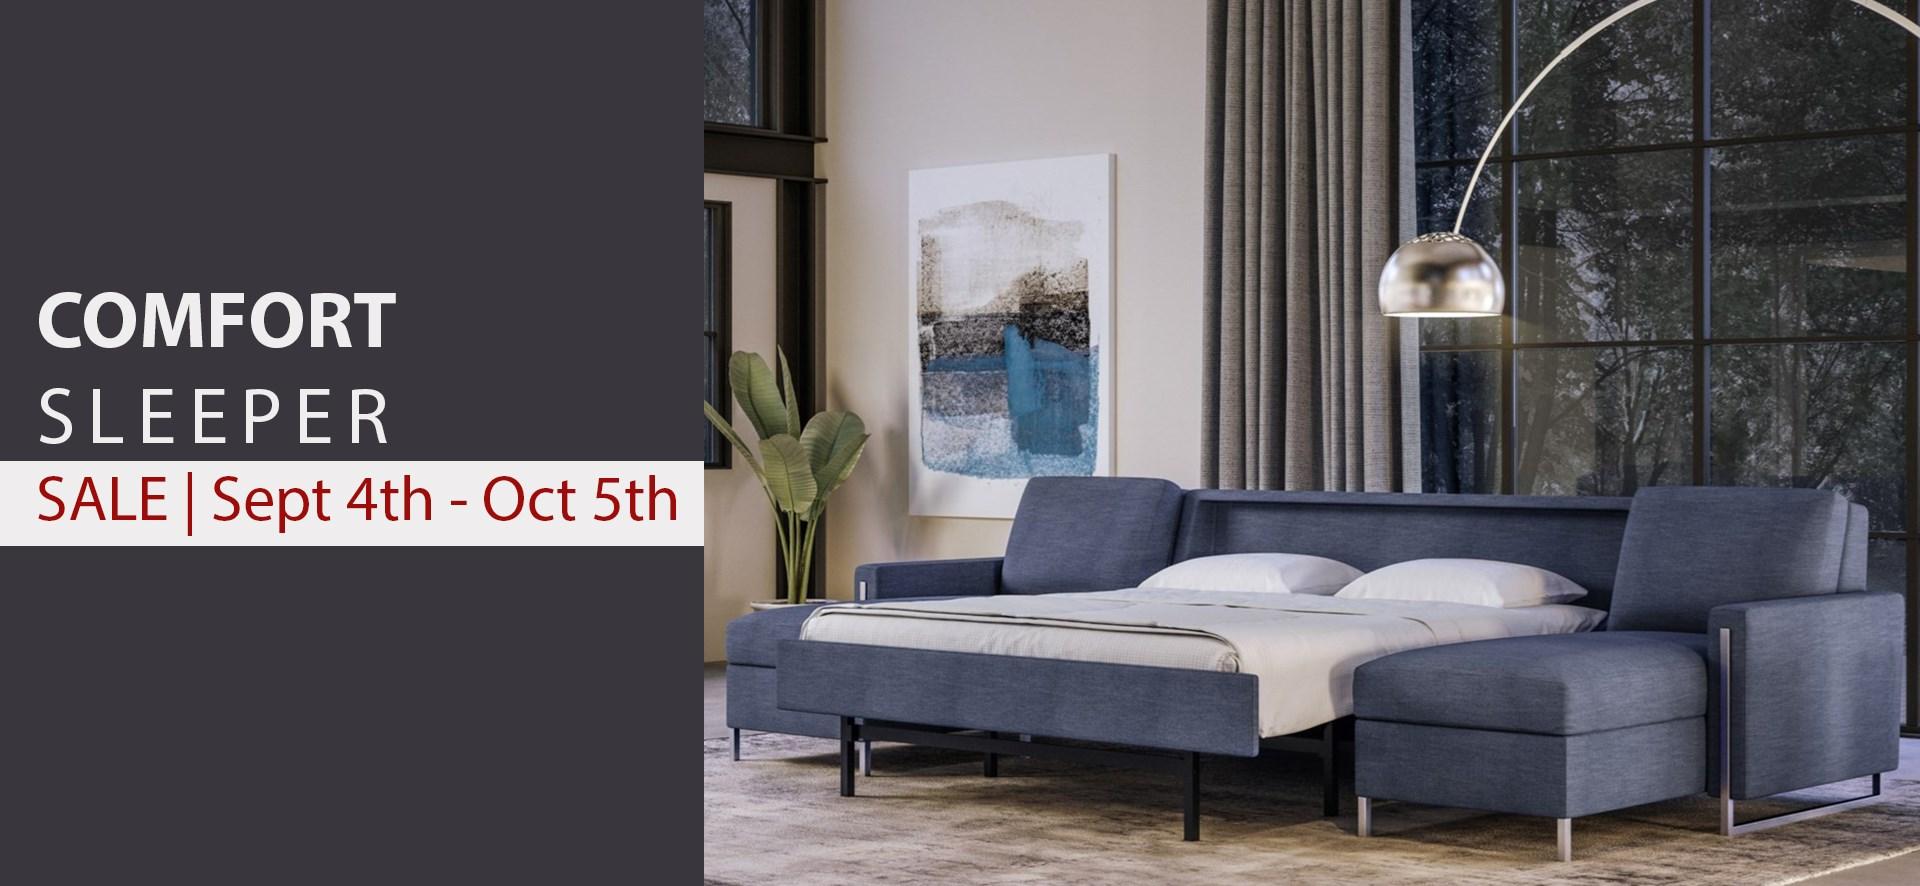 Comfort Sleeper Sale